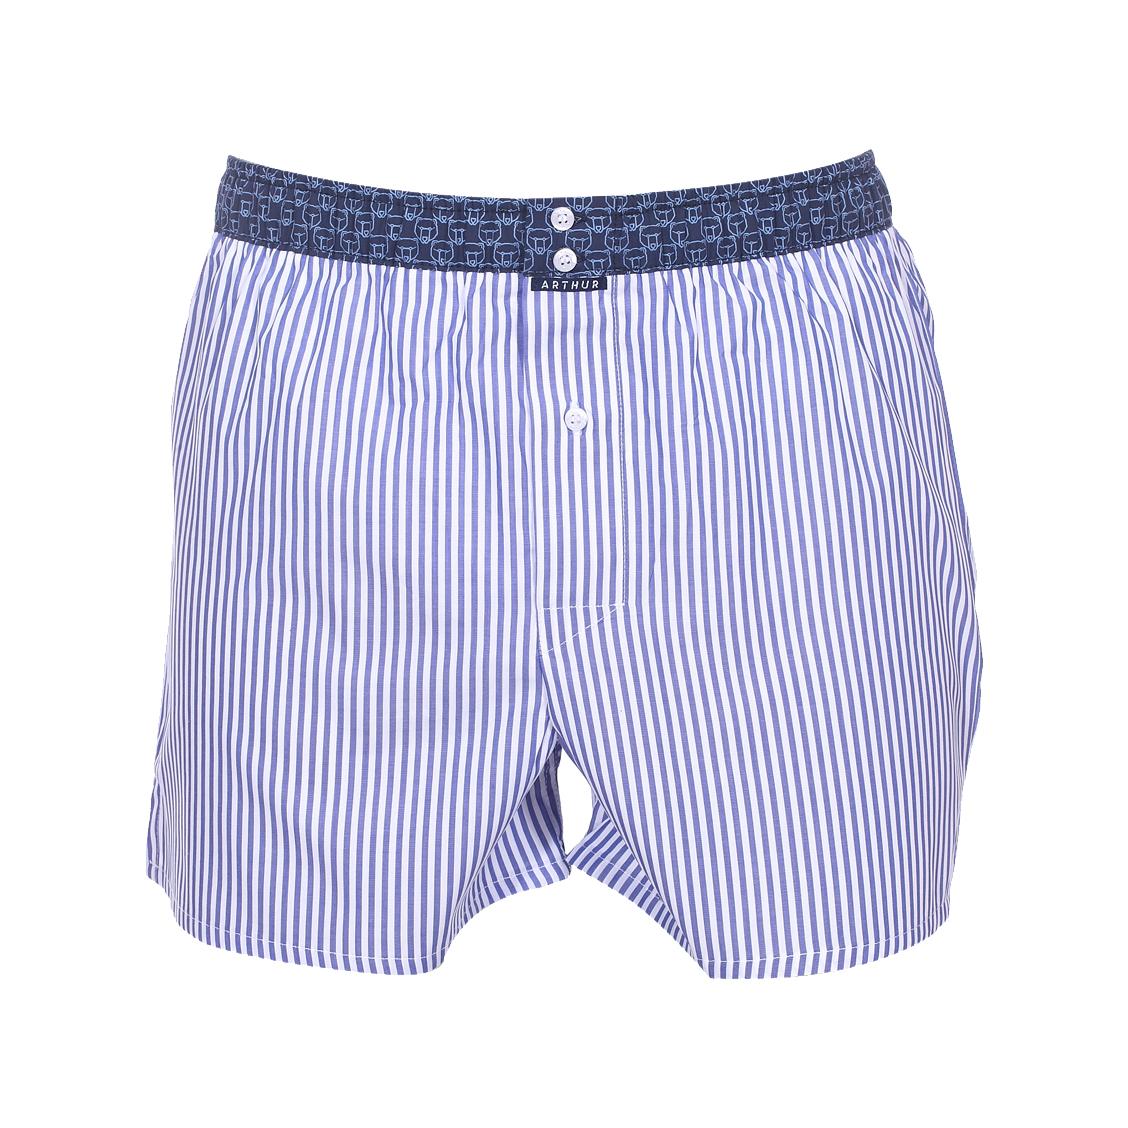 Caleçon club  à rayures blanches et bleu denim ceinture bleu marine à motifs ours bleu clair